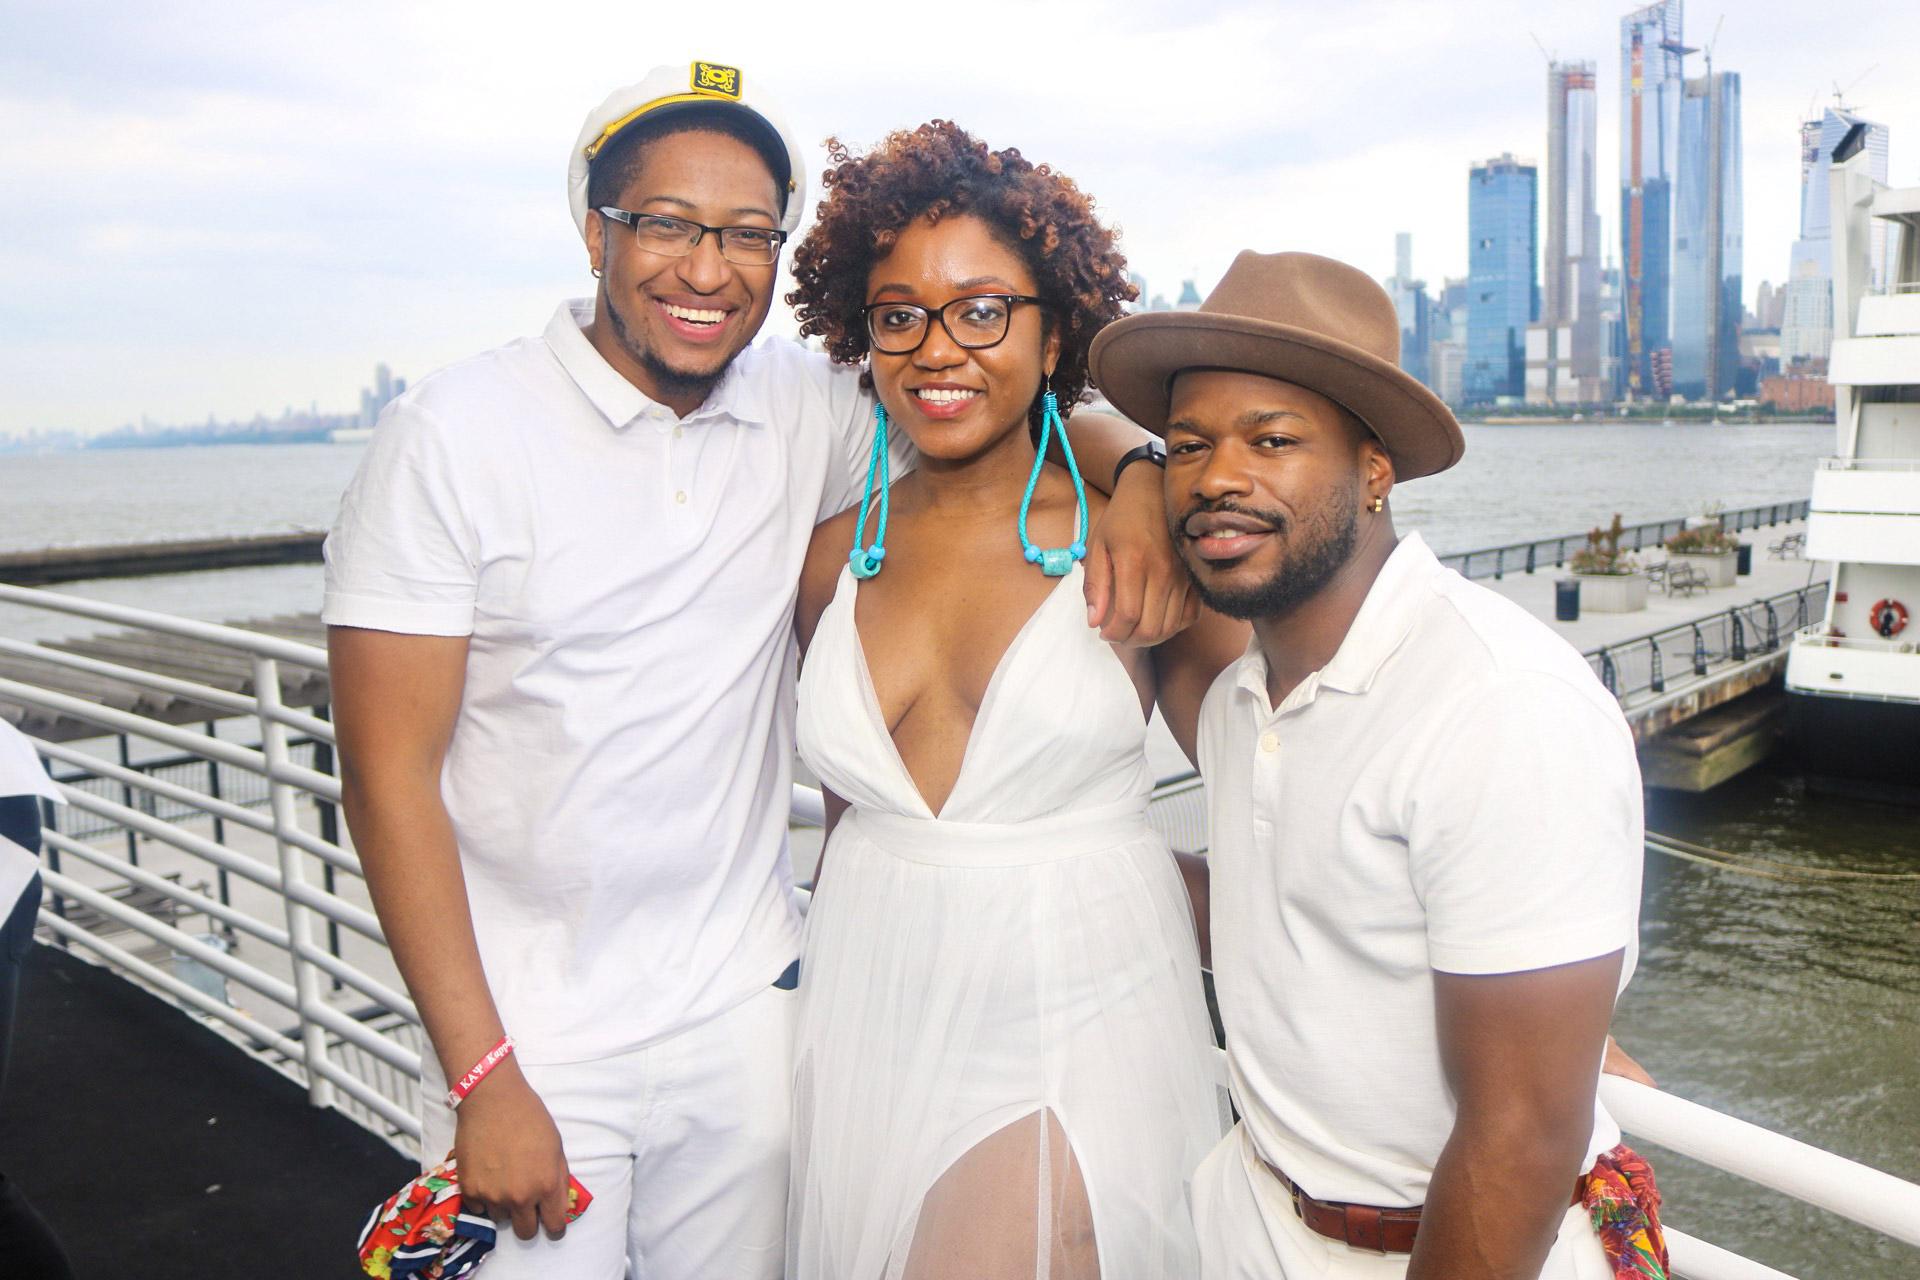 Rock The Boat Brunch August 26,2018 Destiny Cornucopia Hoboken, NJ Photo Credit: Ellifotos